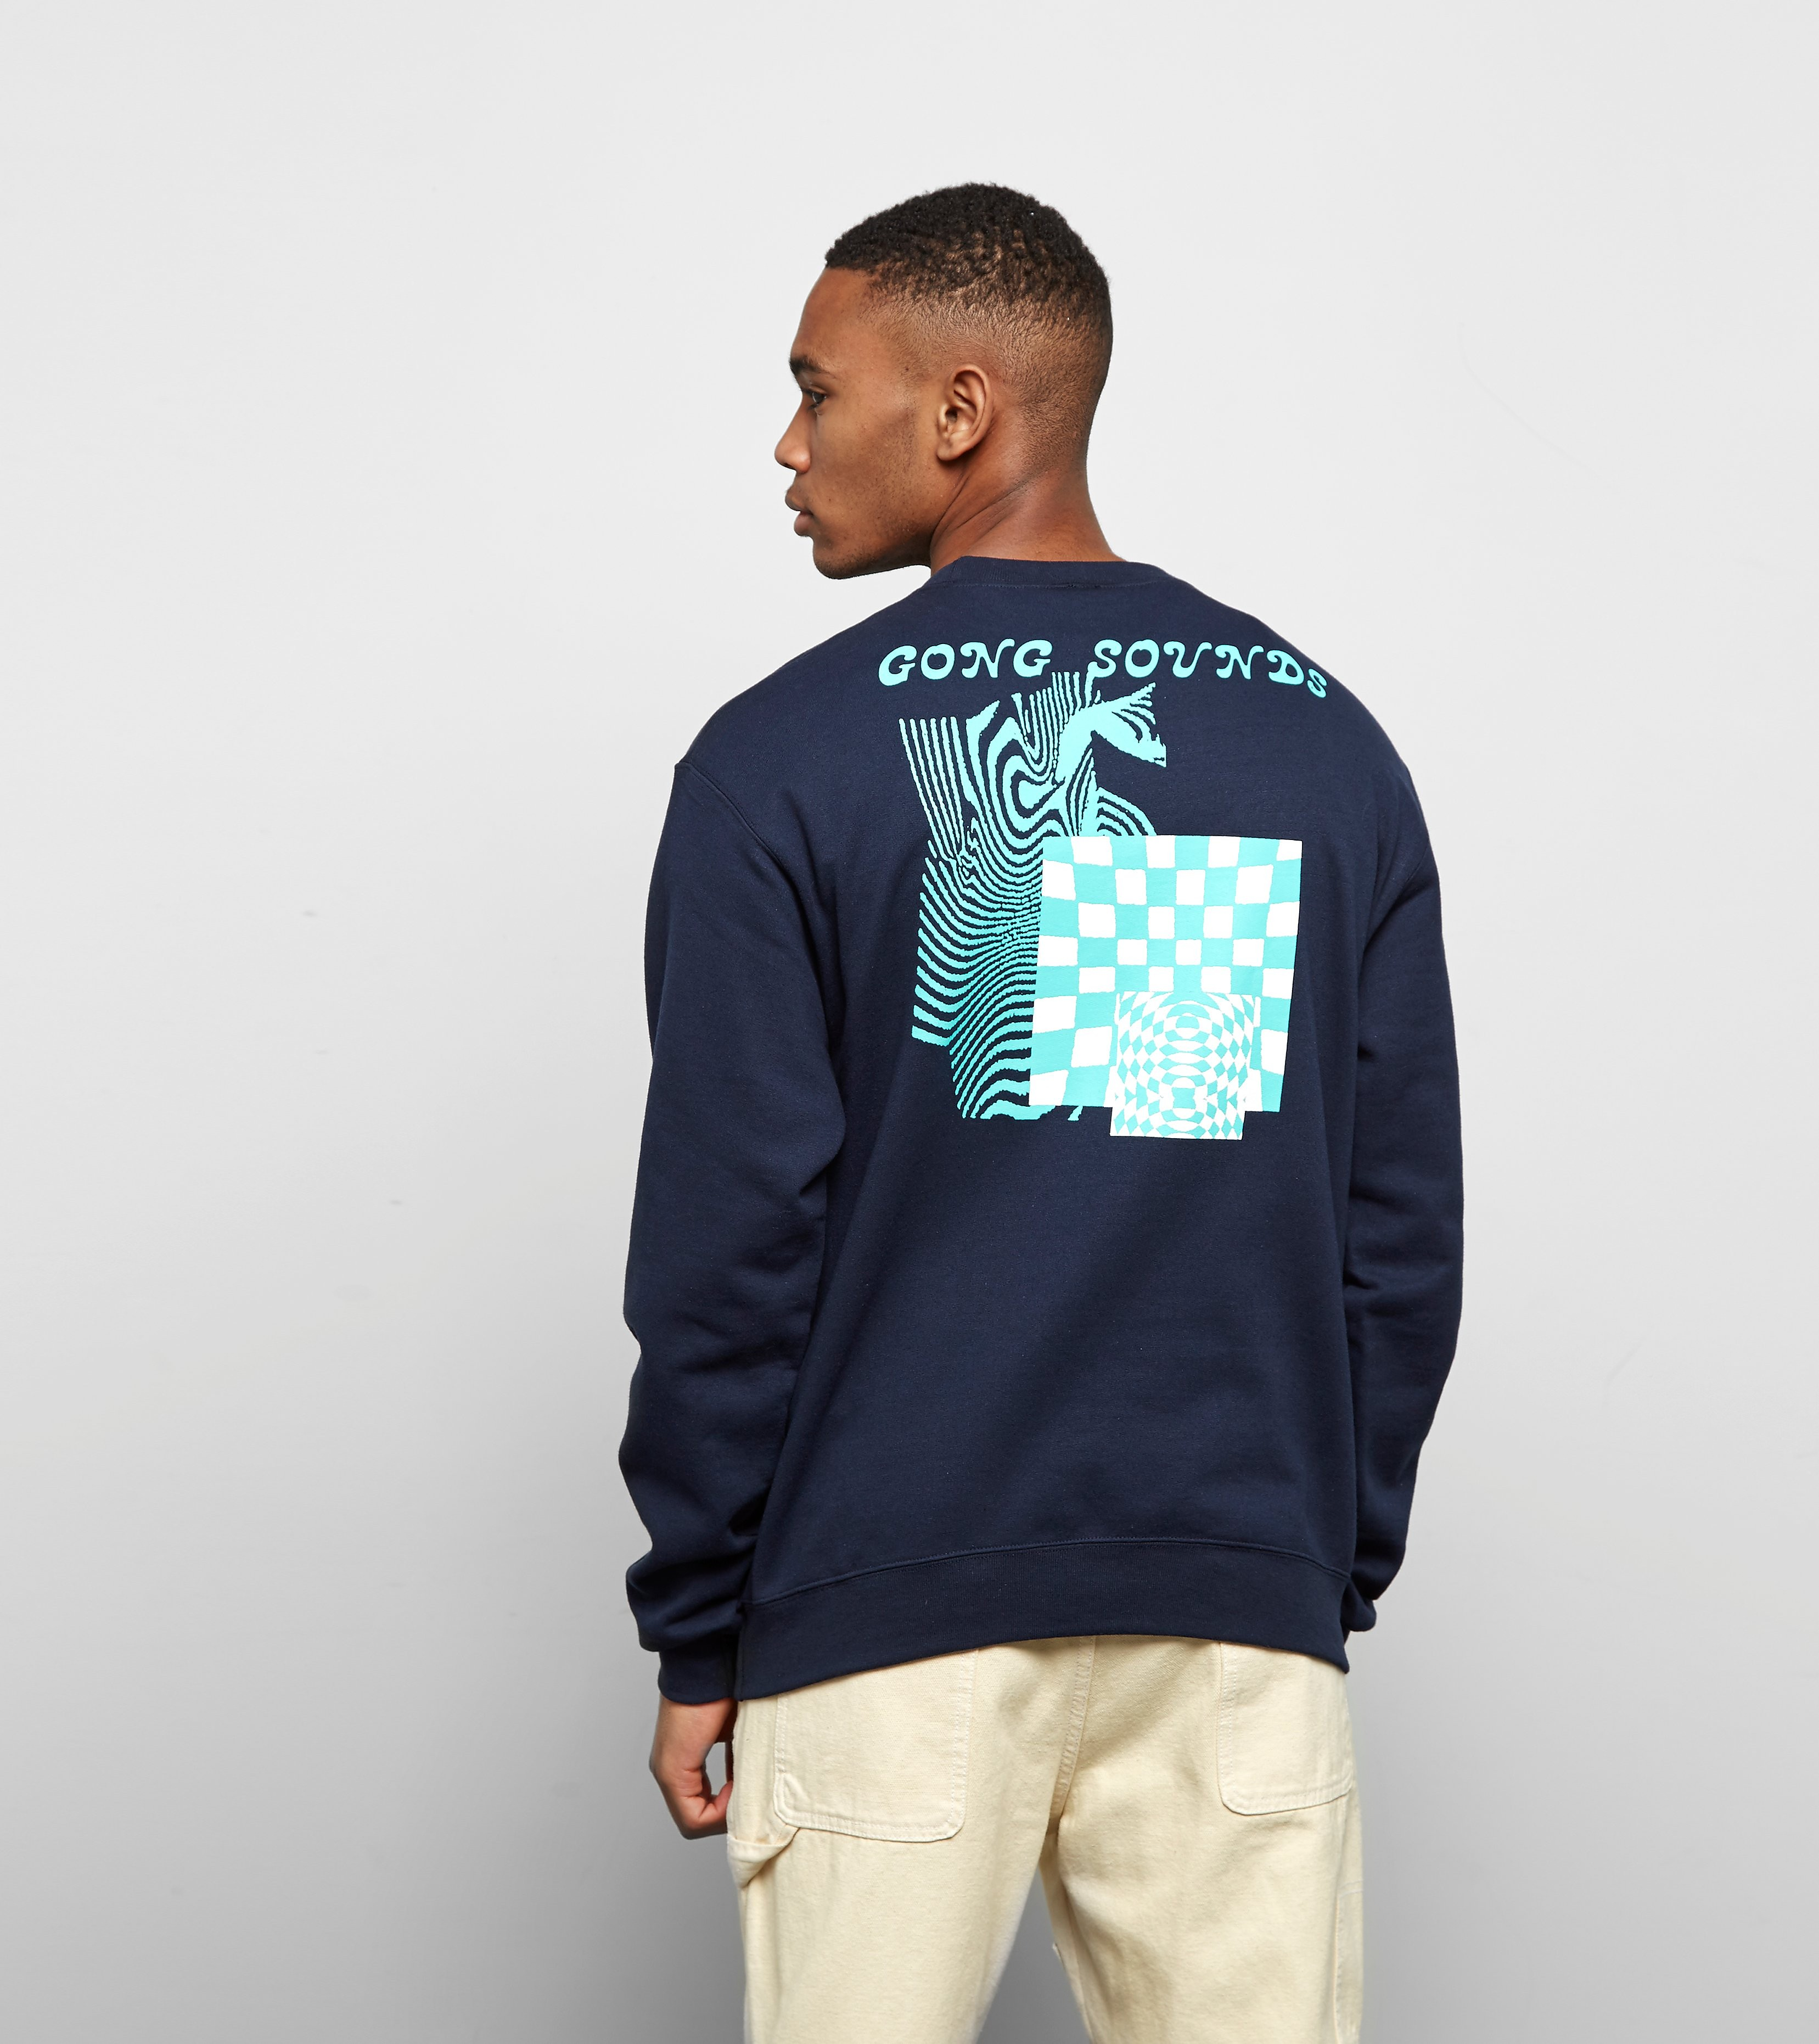 PRMTVO Gong Sounds Sweatshirt